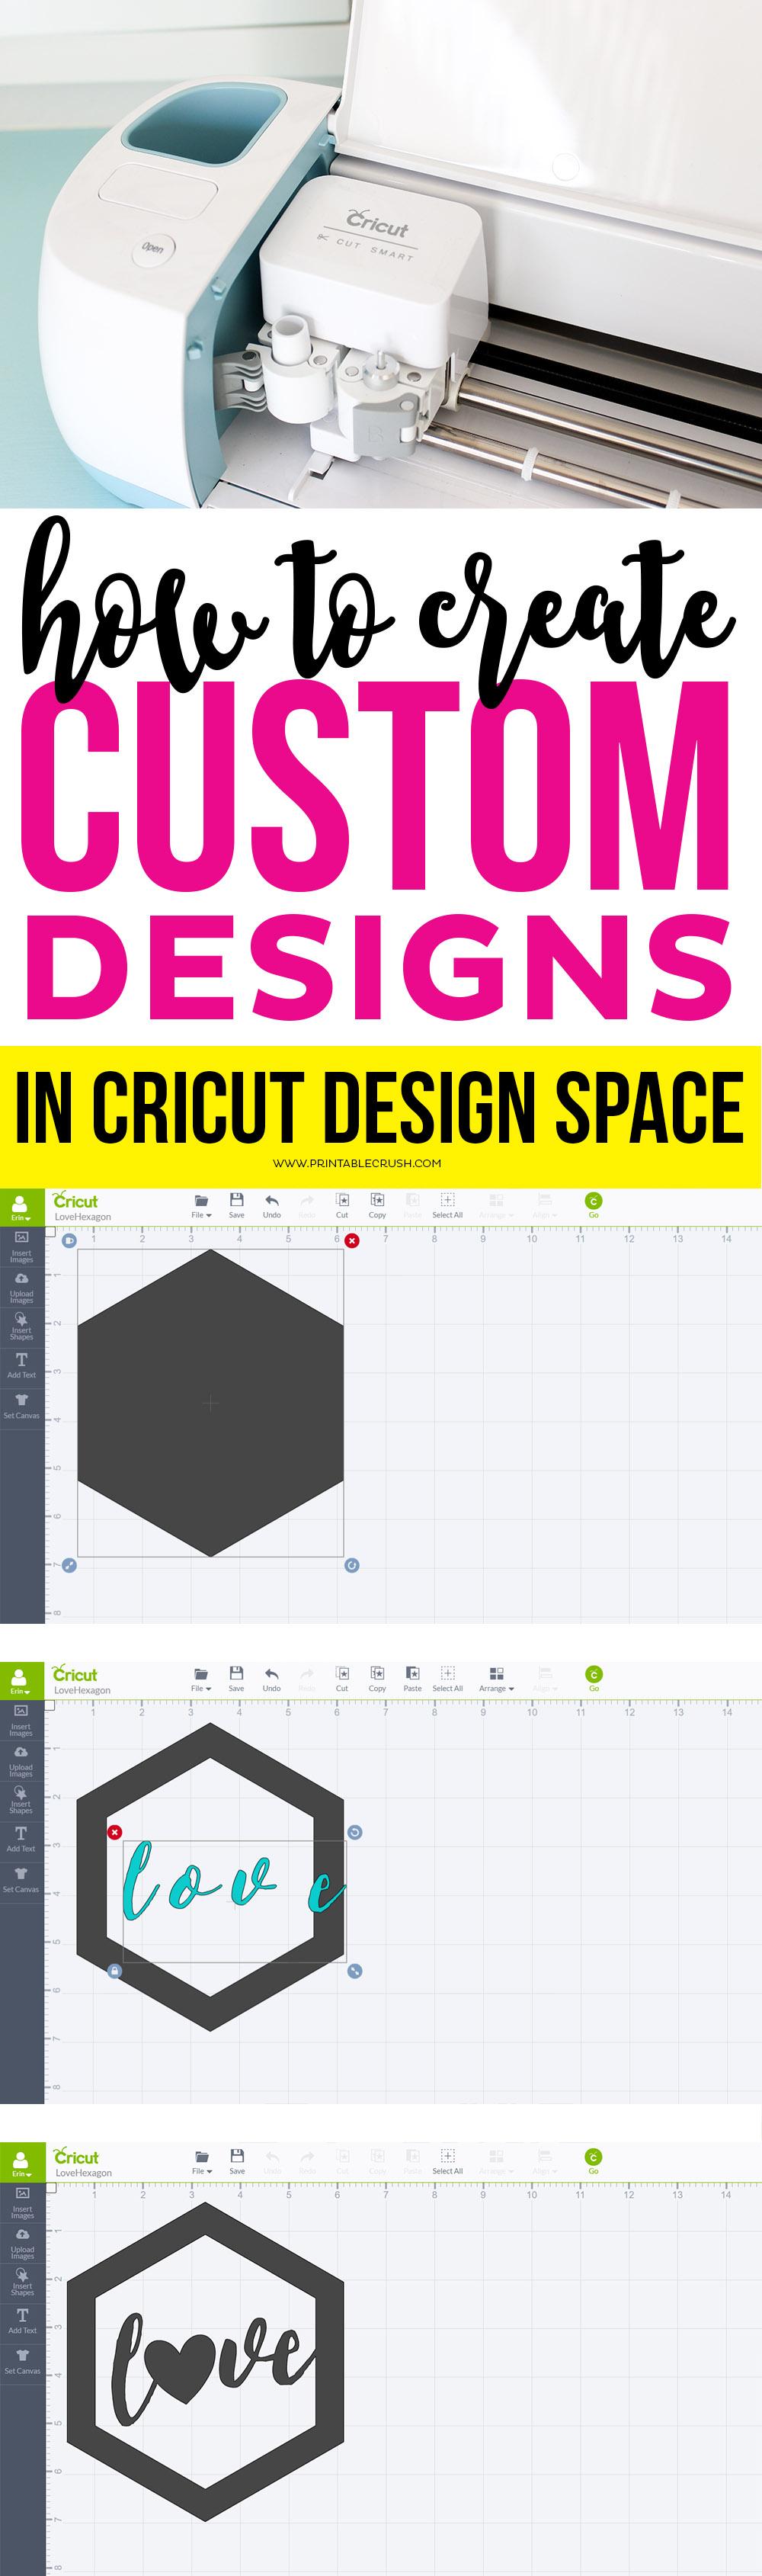 How To Create Custom Designs In Cricut Design Space